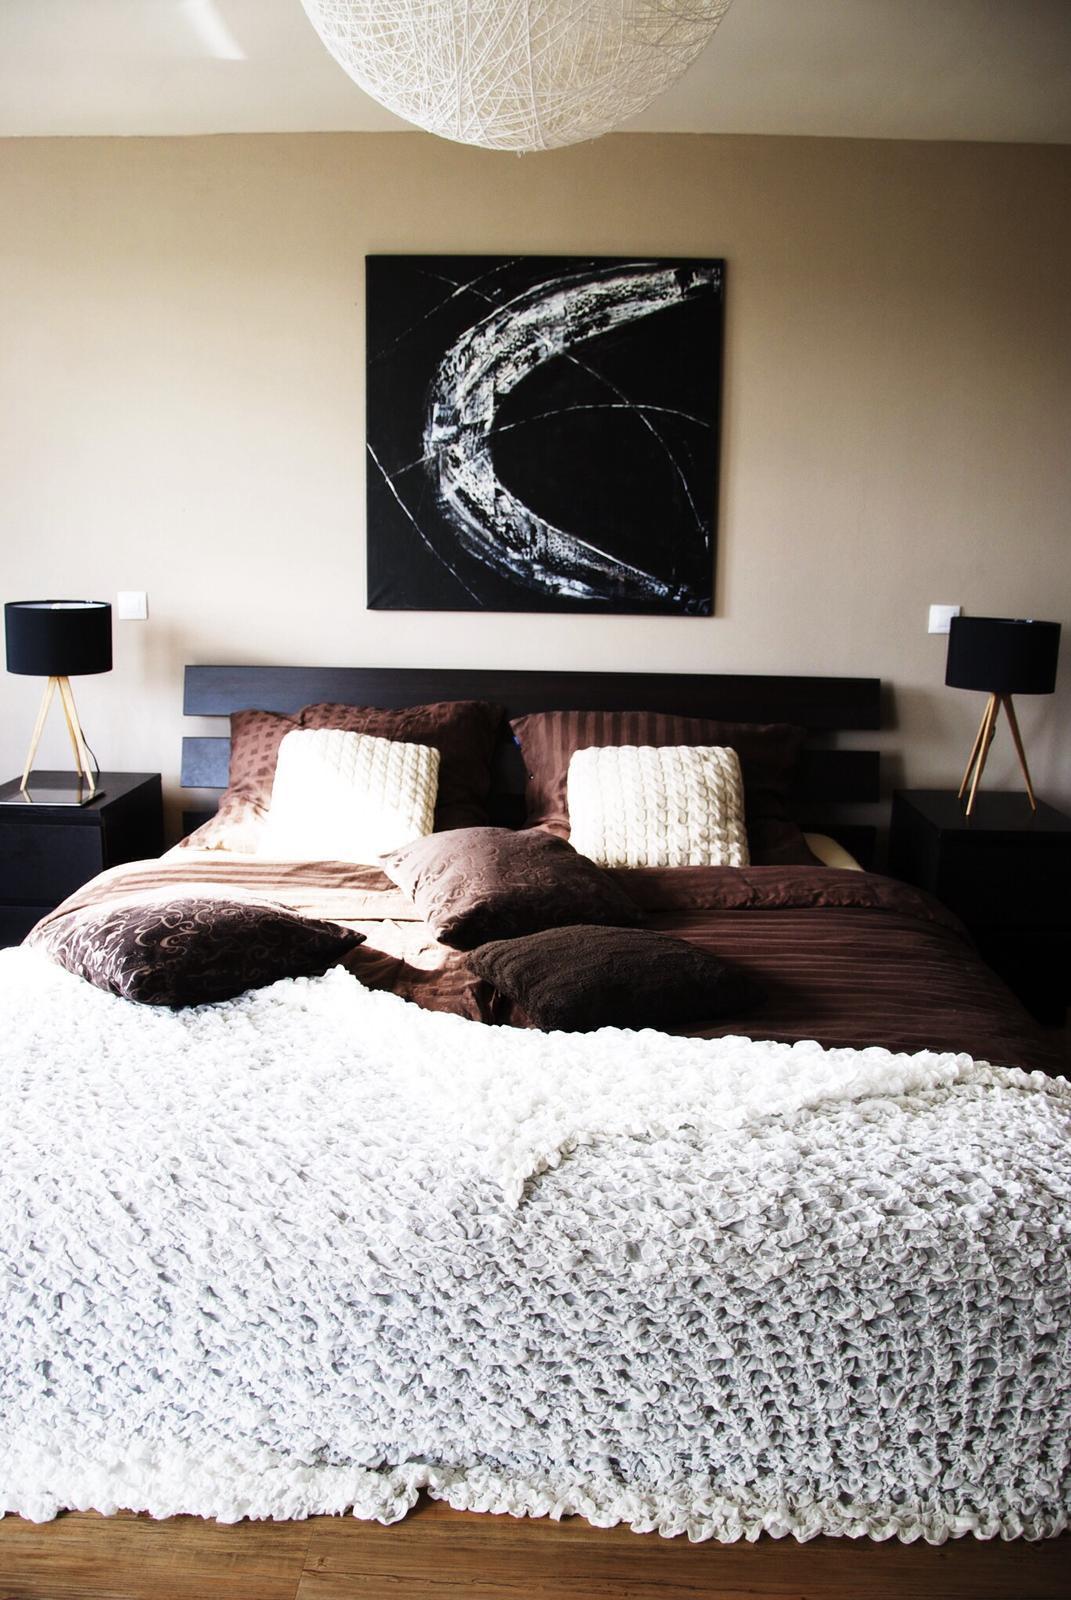 Mé obrazy v interiérech - Mléčná dráha, 95x95 cm , 8000kč na prodej